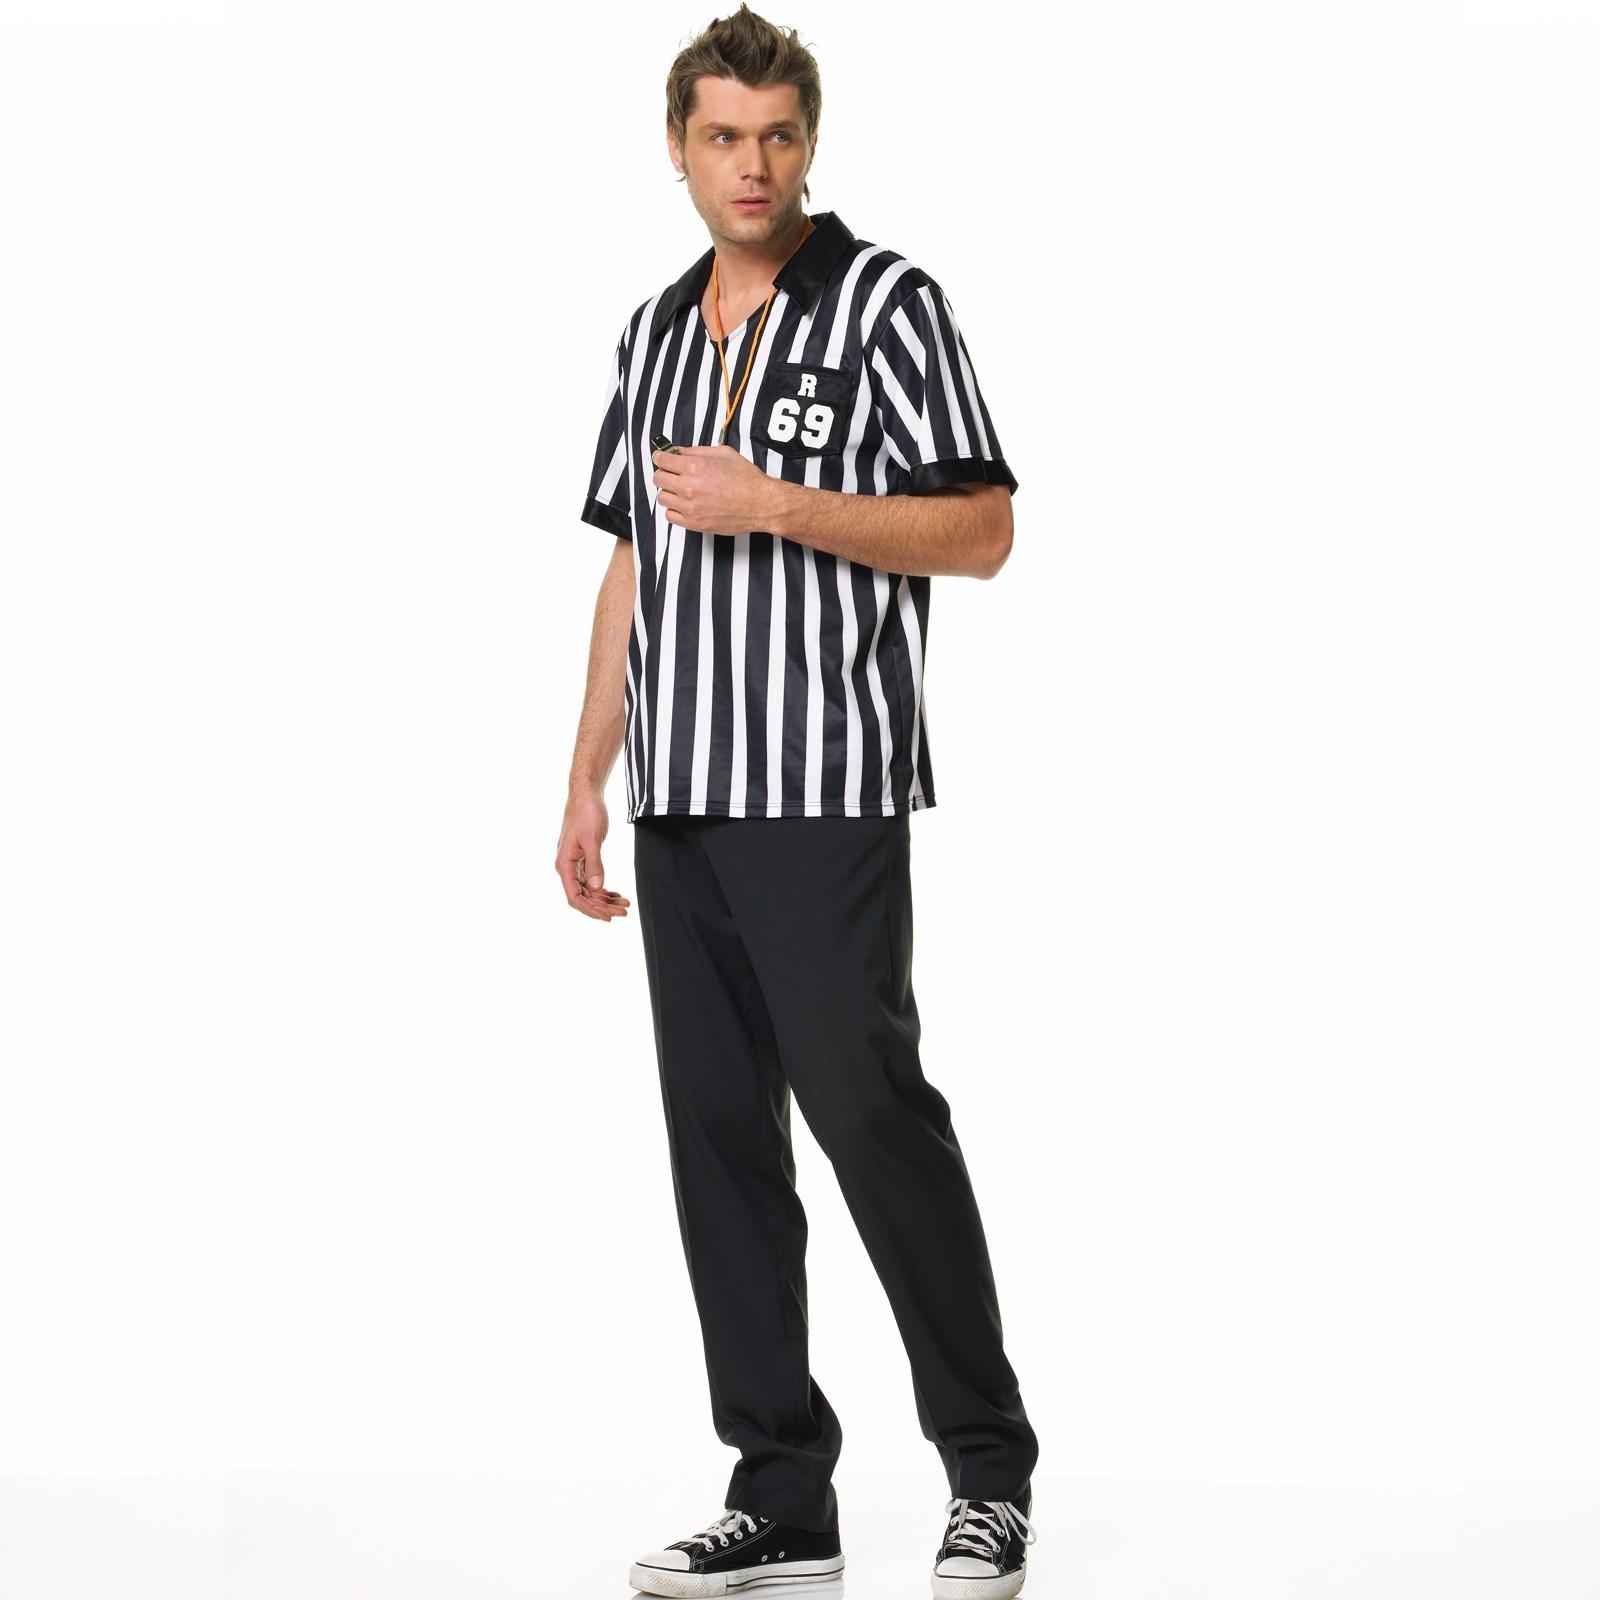 Referee Shirt Adult Costume